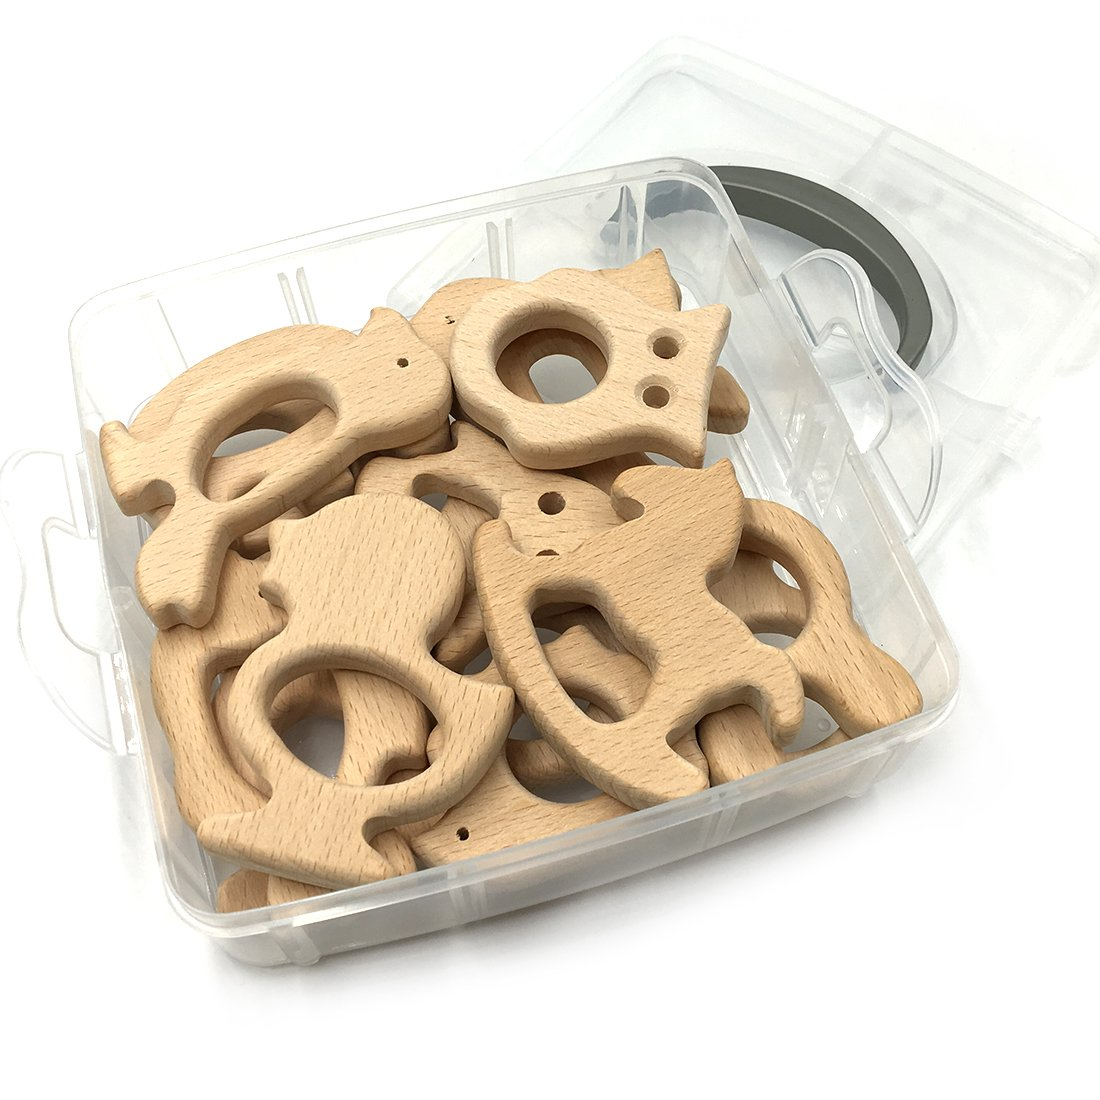 Coskiss DIY Nursing Jewelry Combination Package Blending Natürliche Runde Geometrie Sechskant Wooden Perlen Baby Teether Spielzeug Set (A111)